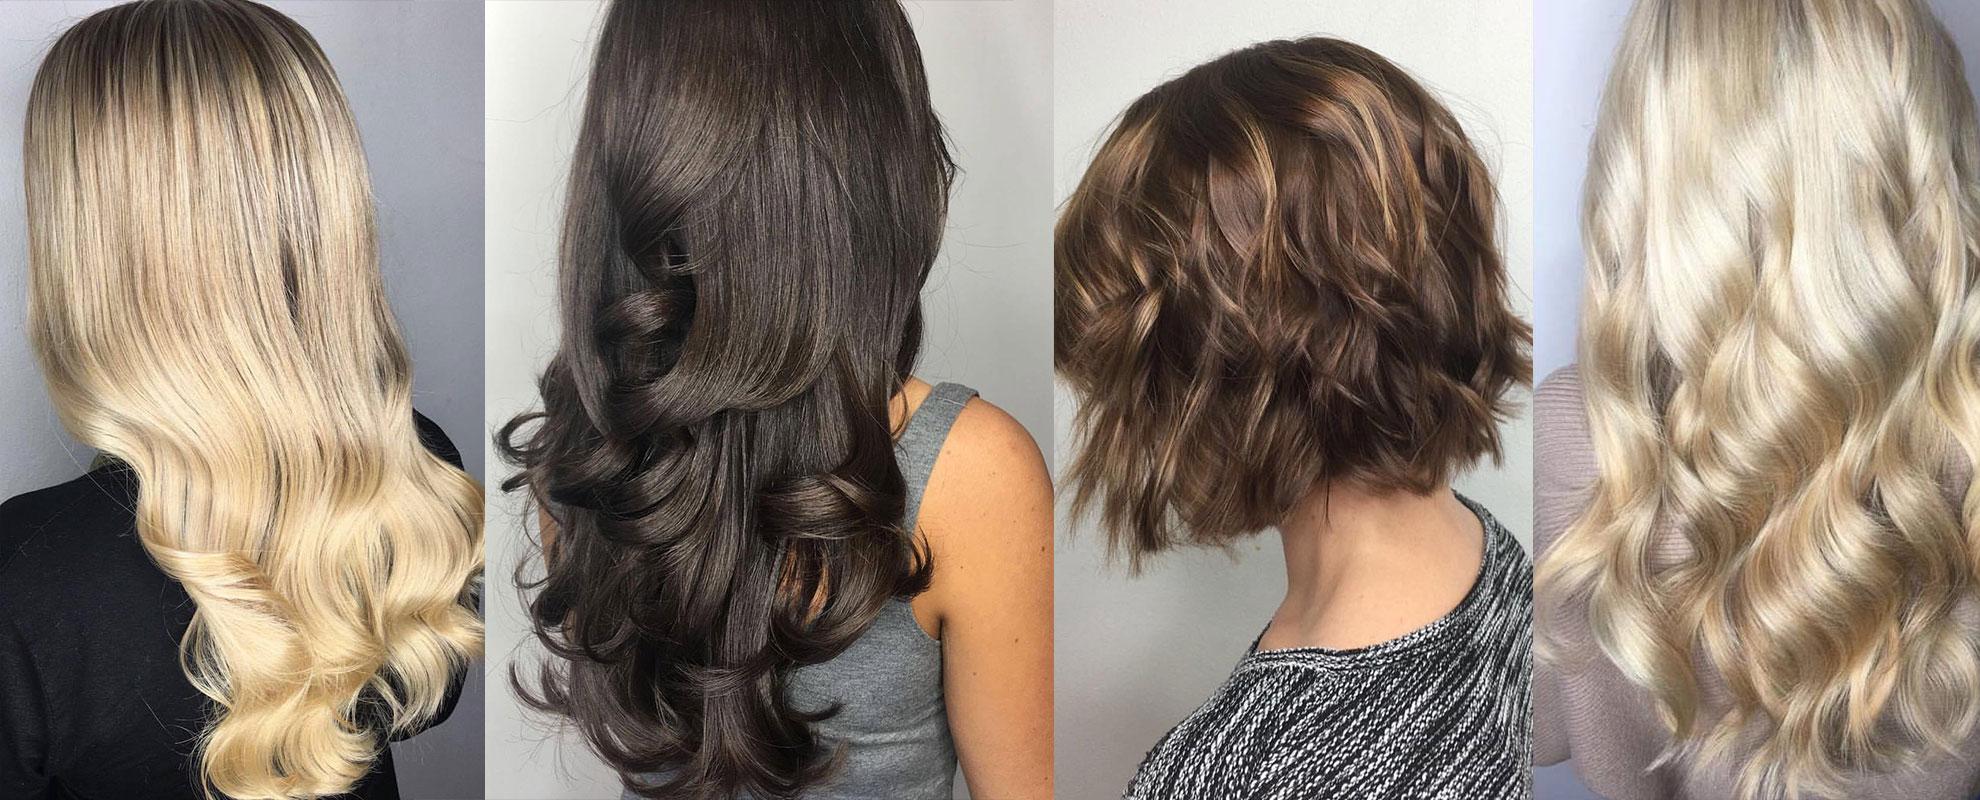 kimmy rose hair studio